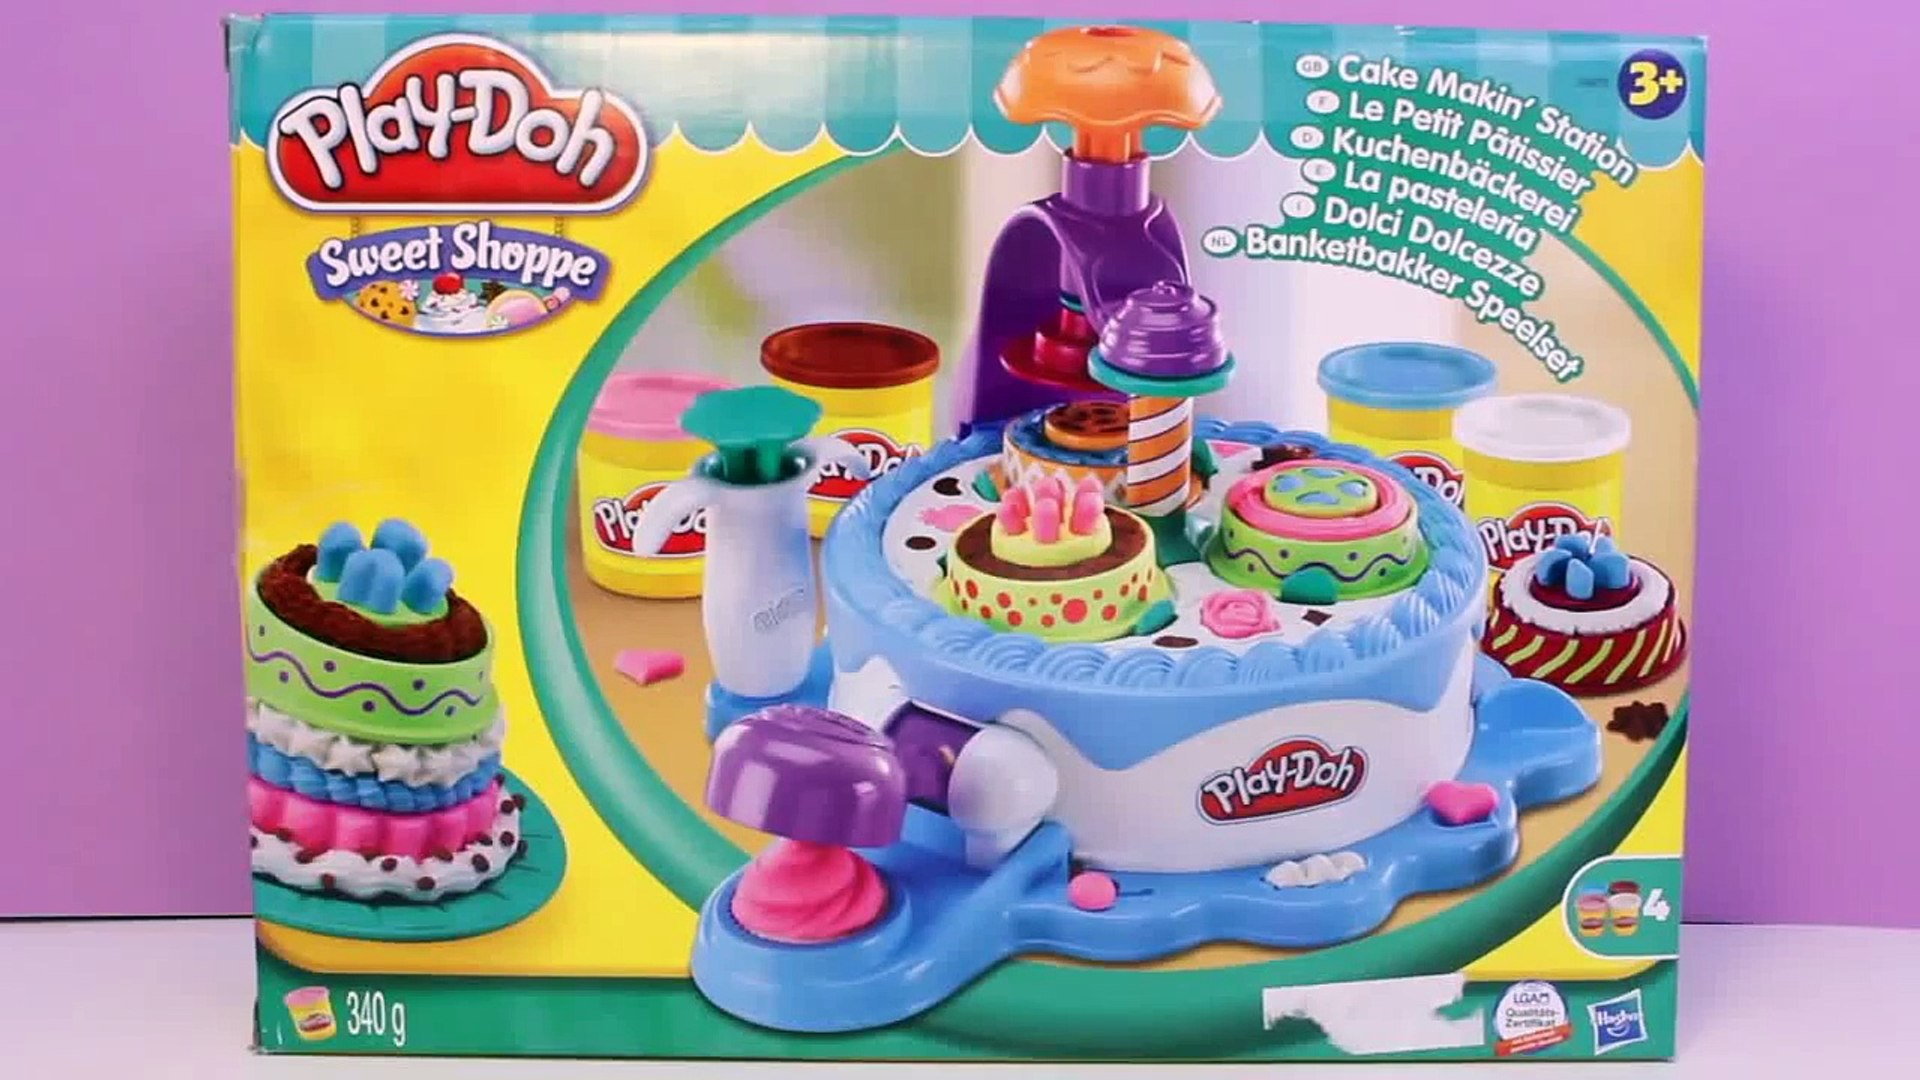 Terrific Play Doh Birthday Cake Play Doh Cake Makin Station Bakery Playset Personalised Birthday Cards Veneteletsinfo